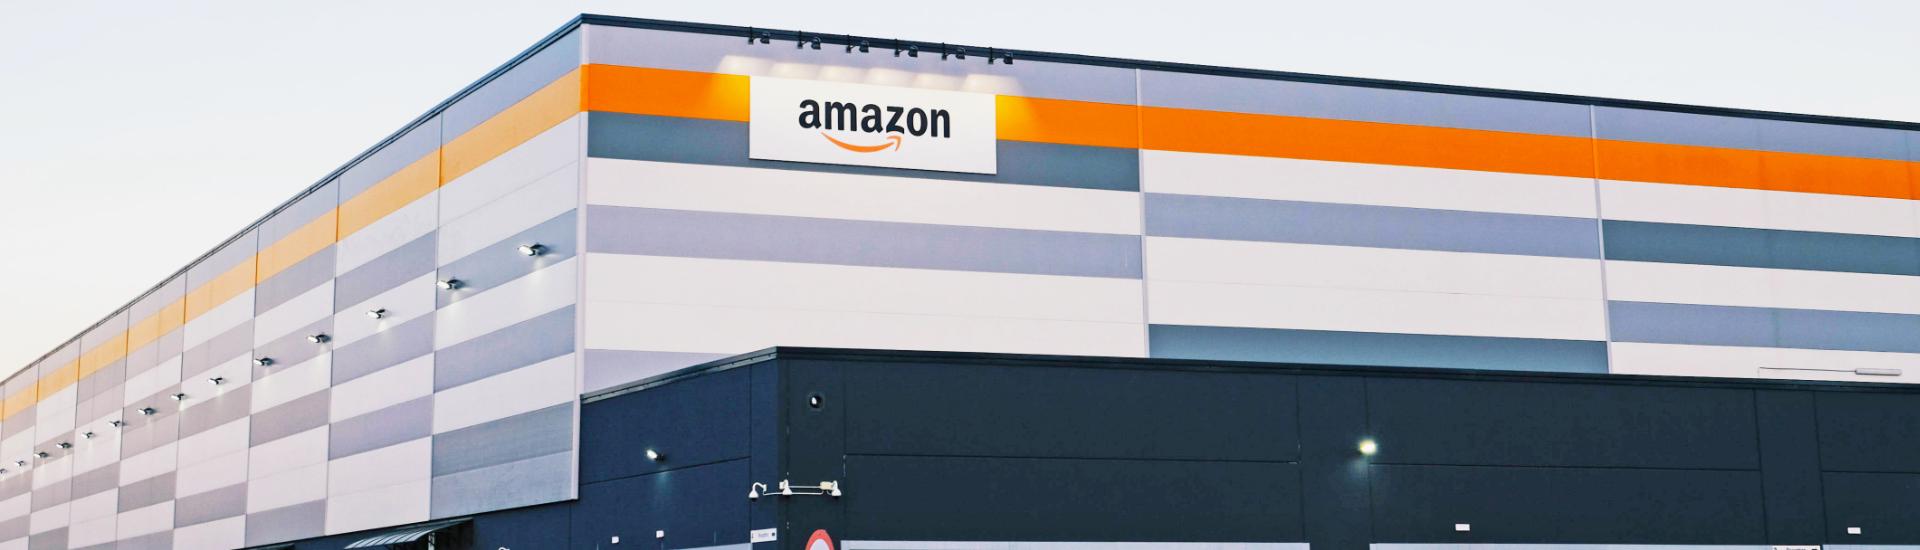 Guided-Imports-China-to-Amazon-FBA